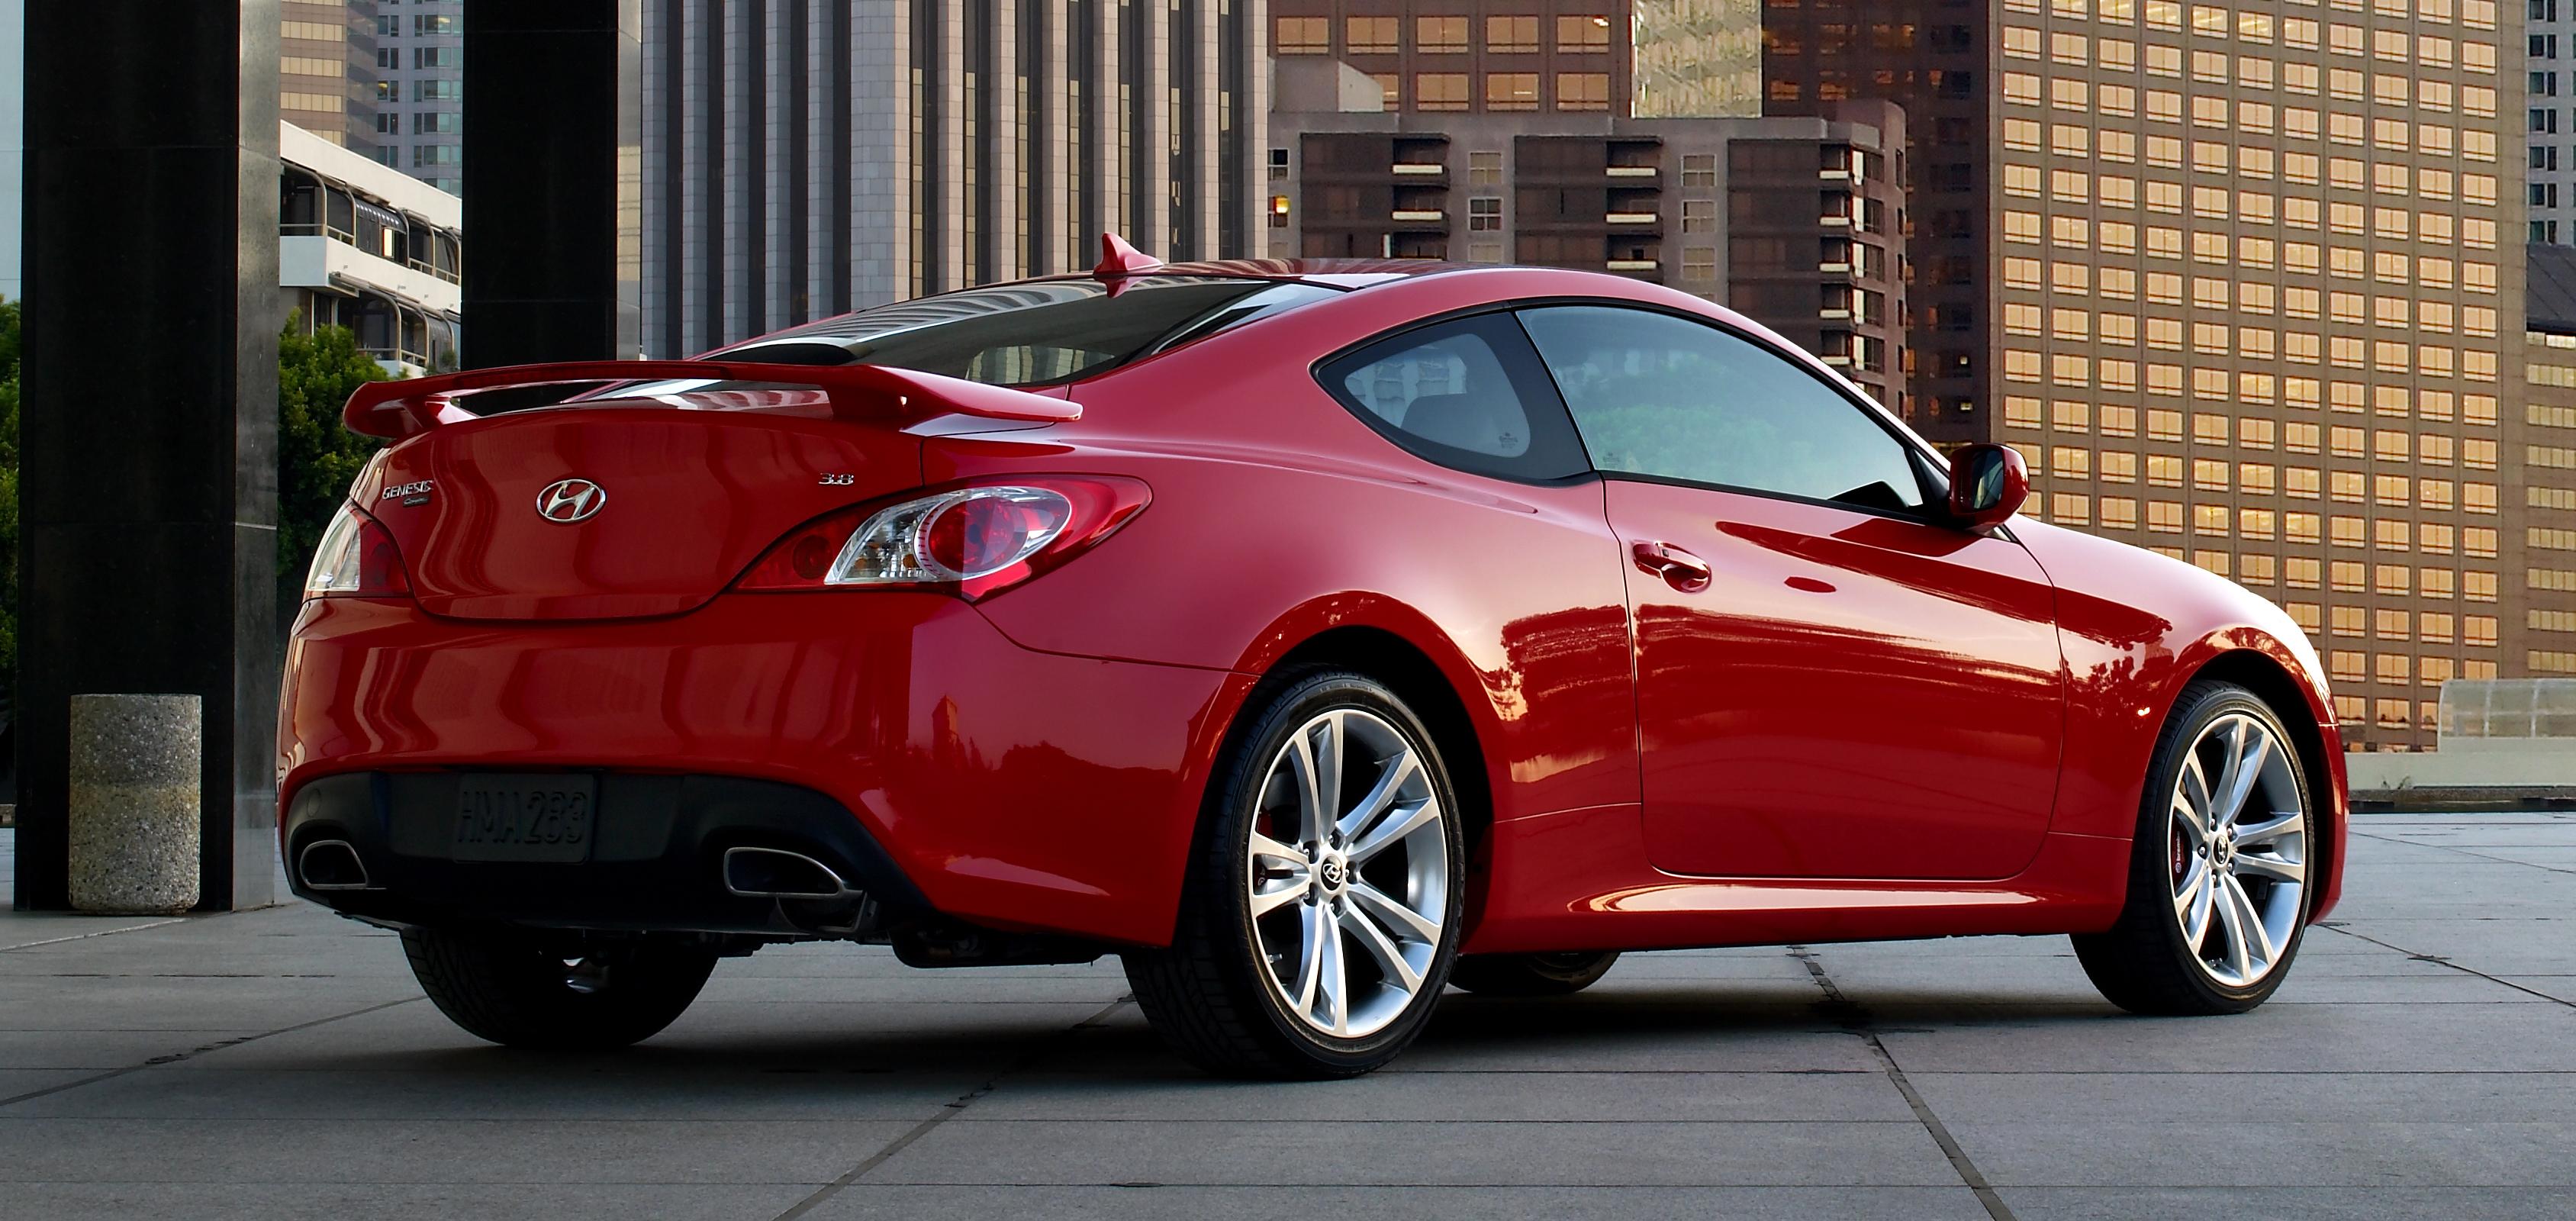 2010 hyundai genesis coupe 3 8 track review autosavant autosavant - Asset_upload_file470_2970